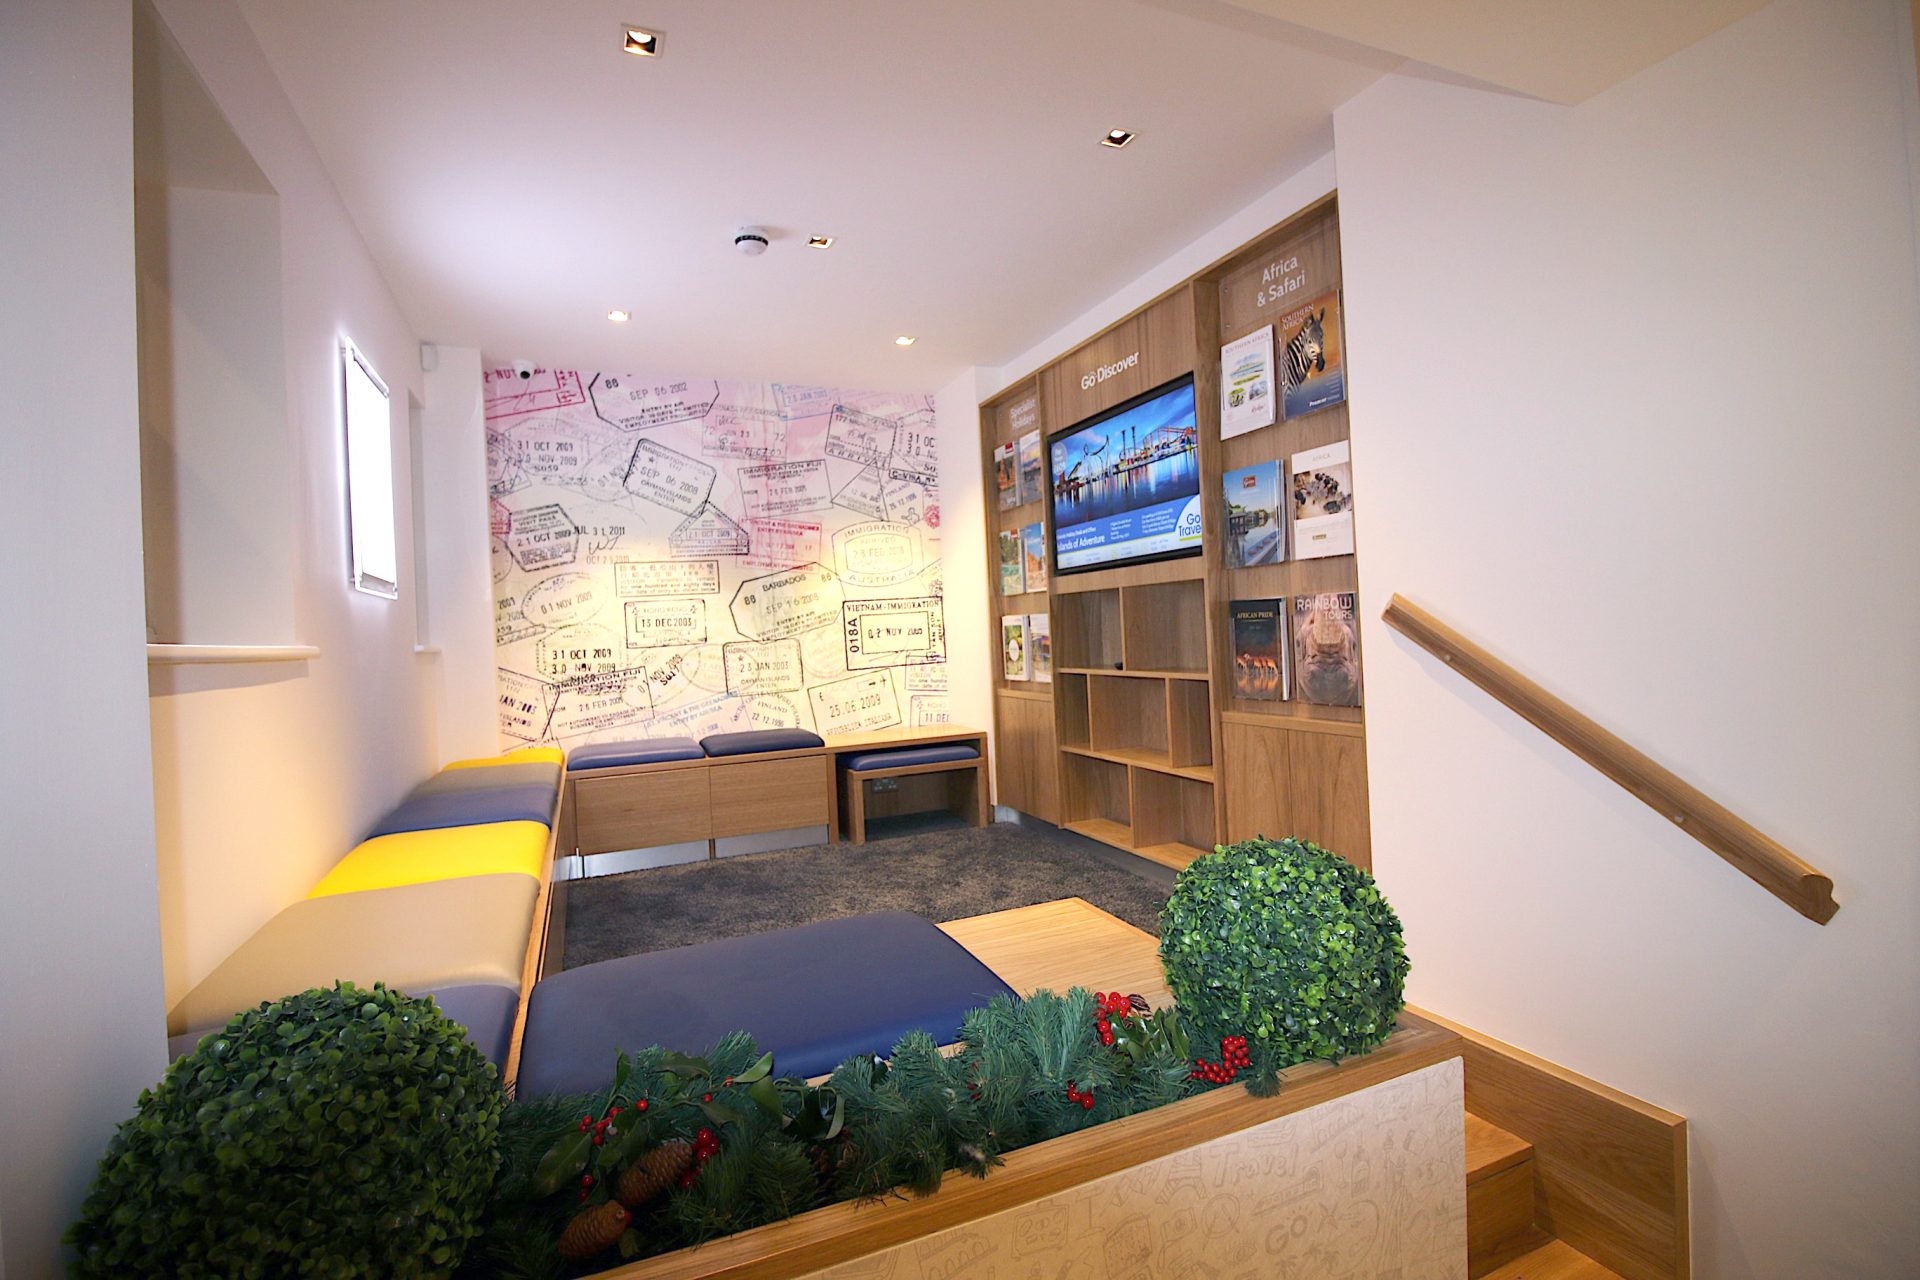 Go Travel_Chislhrust_Interior Design By Nugget Design 15